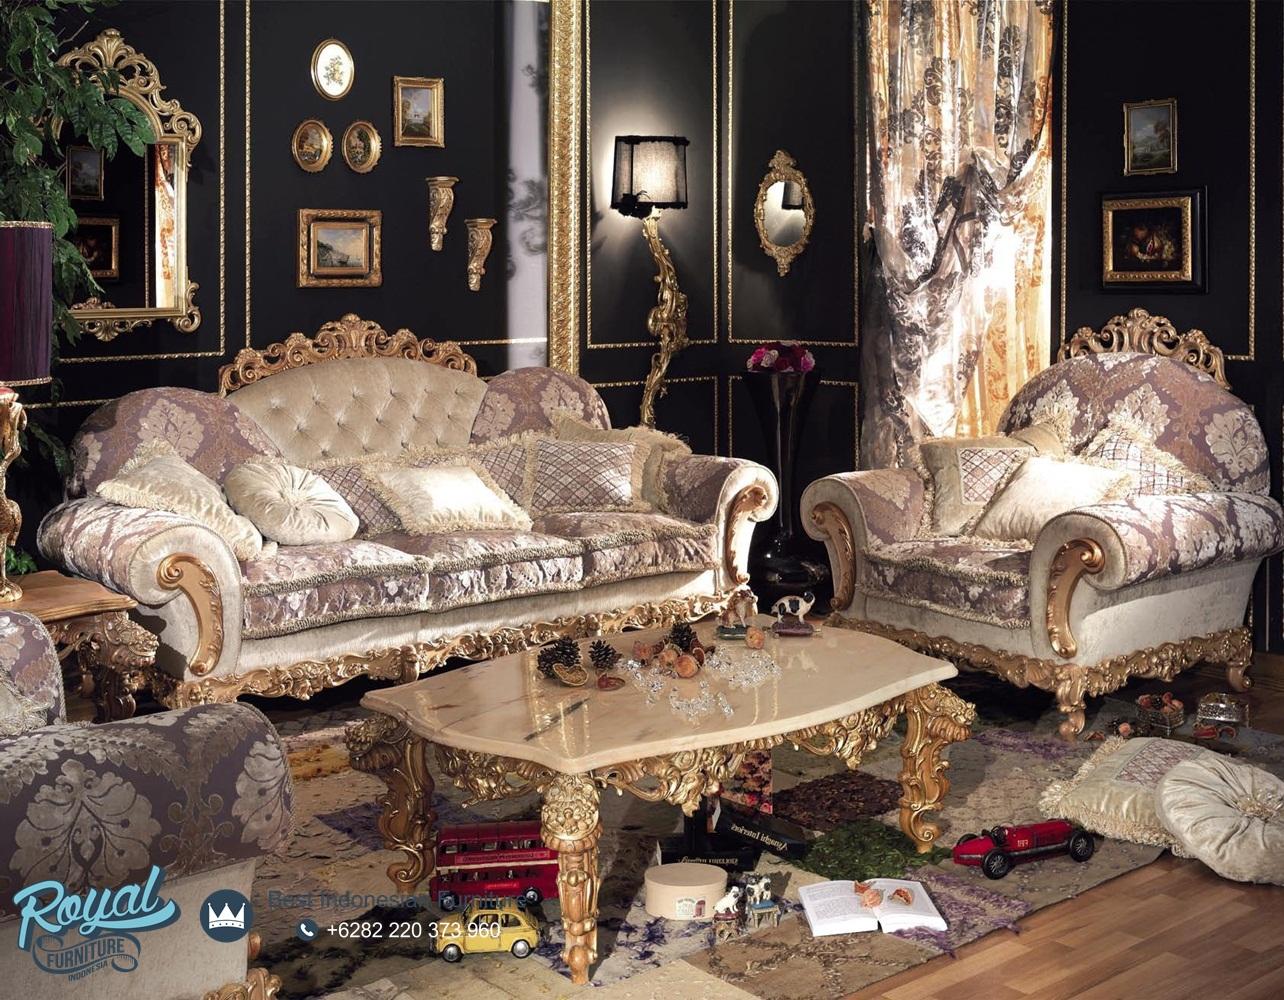 Set Kursi Tamu Sofa Mewah Luxury Italian Furniture Terbaru, Set Sofa Tamu Terbaru,Set Sofa Tamu Mewah , Set Sofa tamu klasik, Furniture Sofa Tamu Minimalis, Furniture Sofa Tamu, Gambar Sofa Tamu, Harga Sofa Tamu Mewah, Kursi Sofa Tamu Mewah, Kursi Sofa Tamu Minimalis, Set Sofa Tamu Mewah, Sofa Kursi Tamu Jepara, Sofa Mewah Ruang Tamu, Sofa Ruang Tamu Elegan, Sofa Ruang Tamu Jati, Sofa Ruang Tamu Jepara, Sofa Ruang Tamu Mewah, Sofa Tamu Jati, Sofa Tamu Jati Jepara, Sofa Tamu Jati Minimalis, Sofa Tamu Jepara, Sofa Tamu Klasik, Sofa Tamu L Minimalis, Sofa Tamu Mewah, Sofa Tamu Mewah Klasik, Sofa Tamu Minimalis, Sofa Tamu Minimalis Jati, Sofa Tamu Minimalis Mewah, Sofa Tamu Minimalis Modern, Sofa Tamu Minimalis Murah, Sofa Tamu Minimalis Terbaru, Sofa Tamu Modern, Sofa Tamu Murah, Sofa Tamu Set Minimalis, Sofa Tamu Sudut Minimalis, Sofa Tamu Ukir Mewah, Sofa Tamu Ukiran Jepara,Royal Furniture